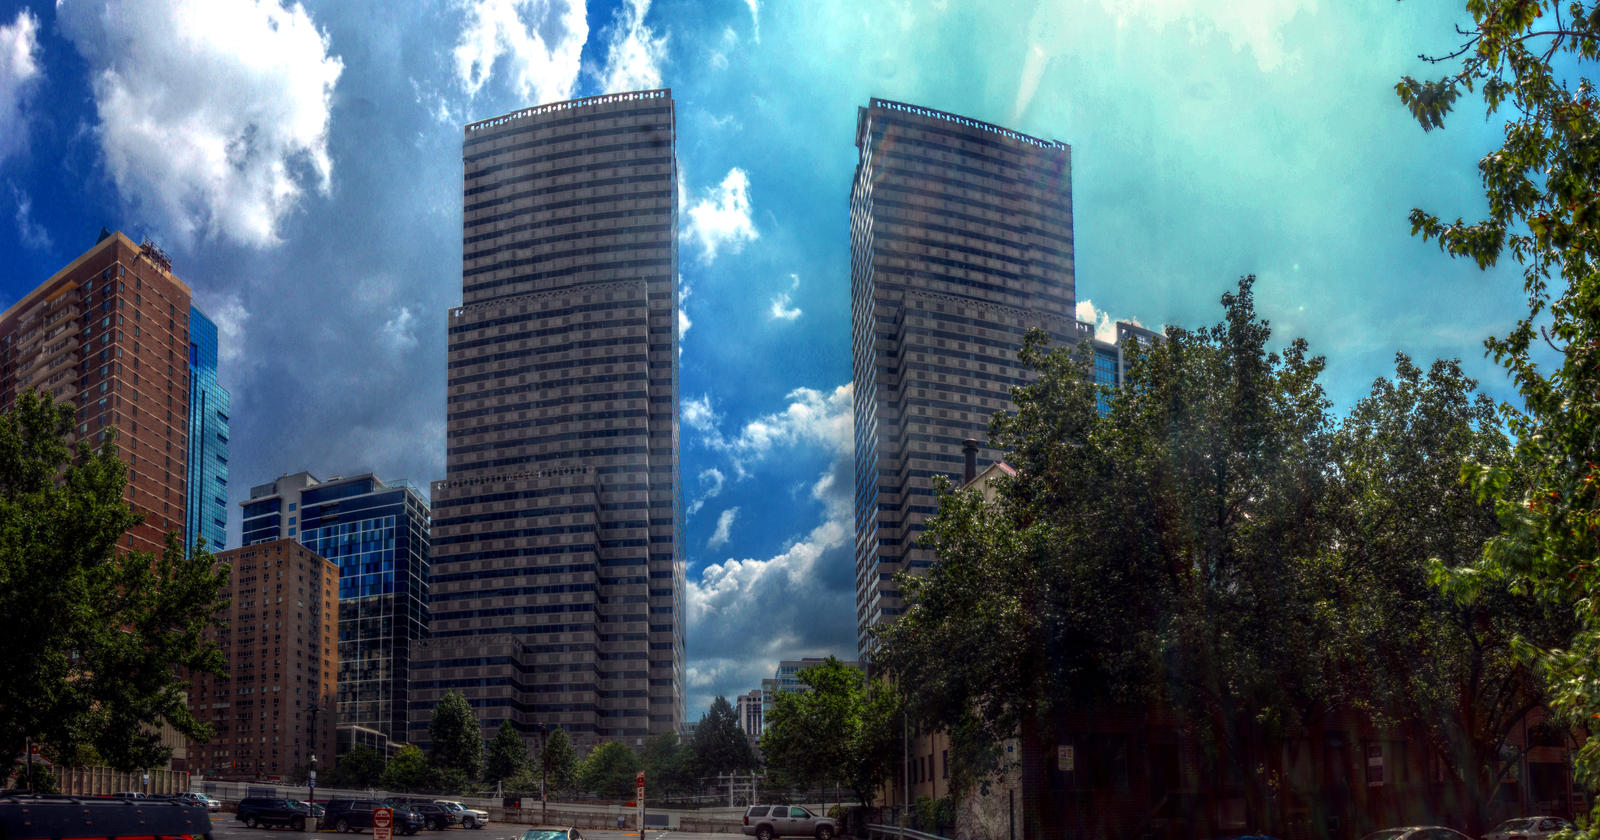 Panorama 3776 hdr pregamma 1 mantiuk06 contrast ma by bruhinb